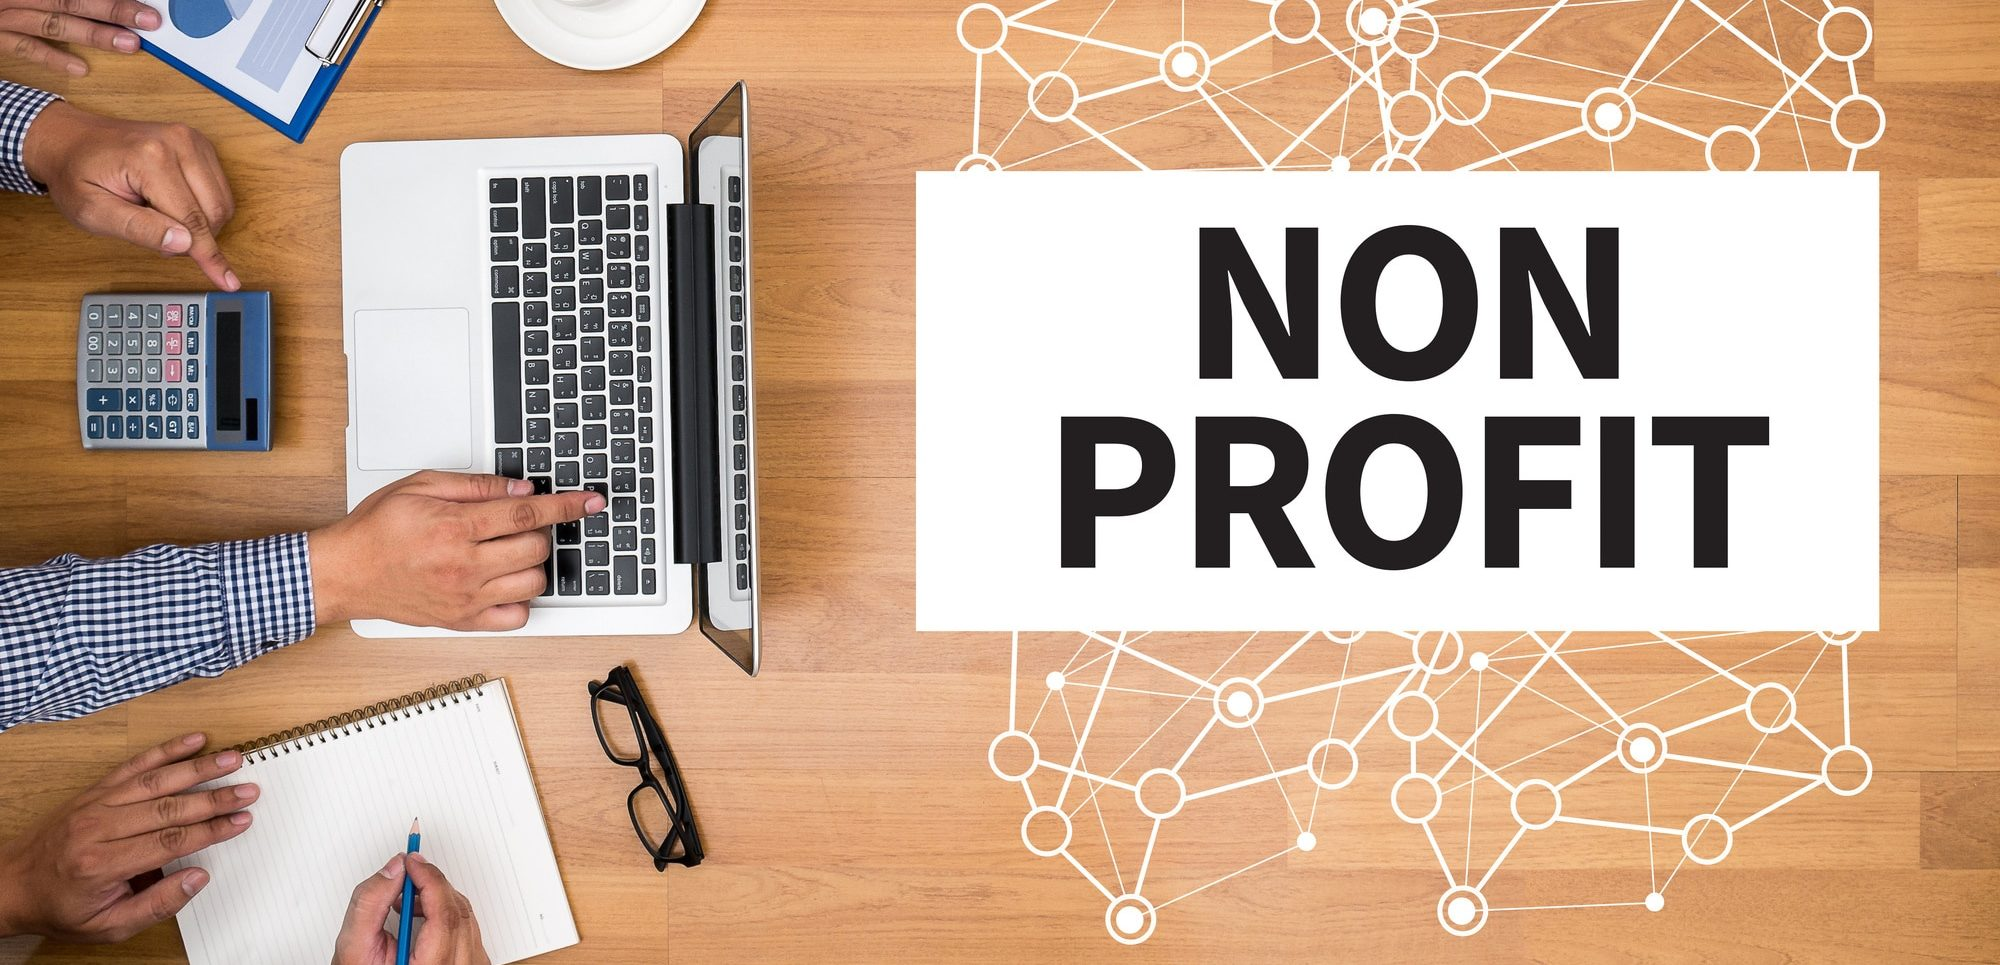 How Can Web Development Benefit Small Non-profit Organizations?